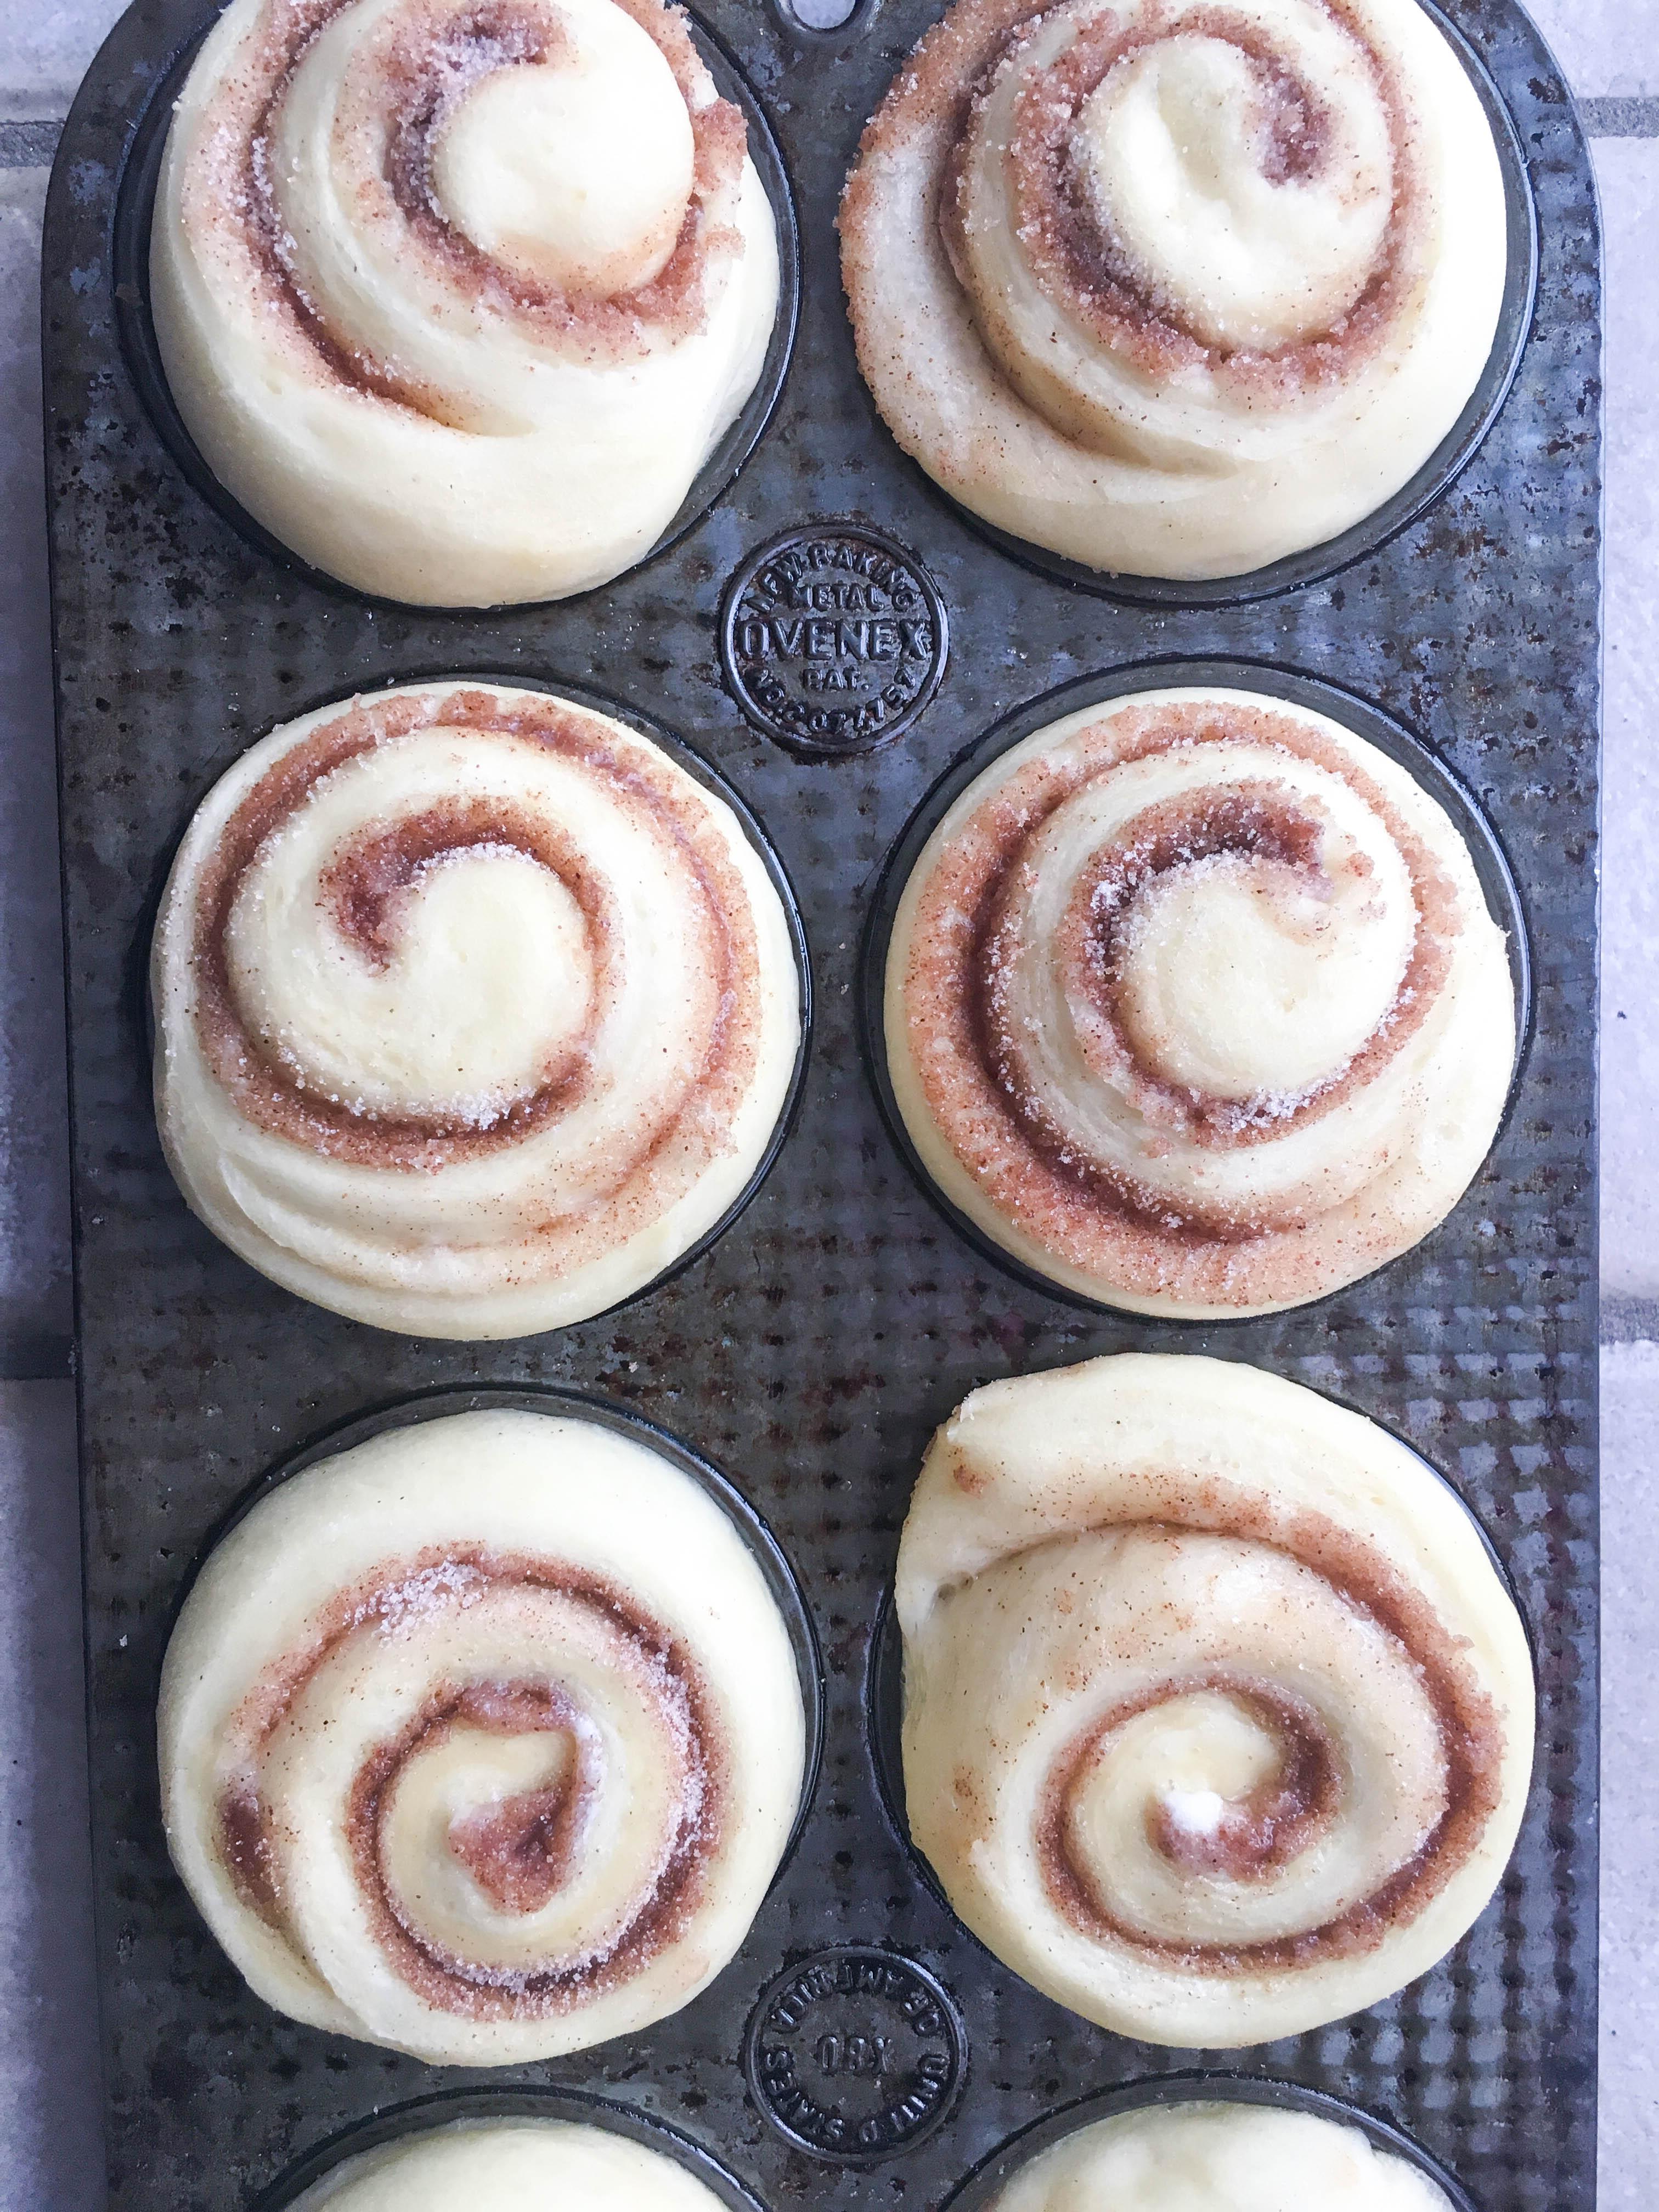 muffin tin cinnamon rolls raising in pan